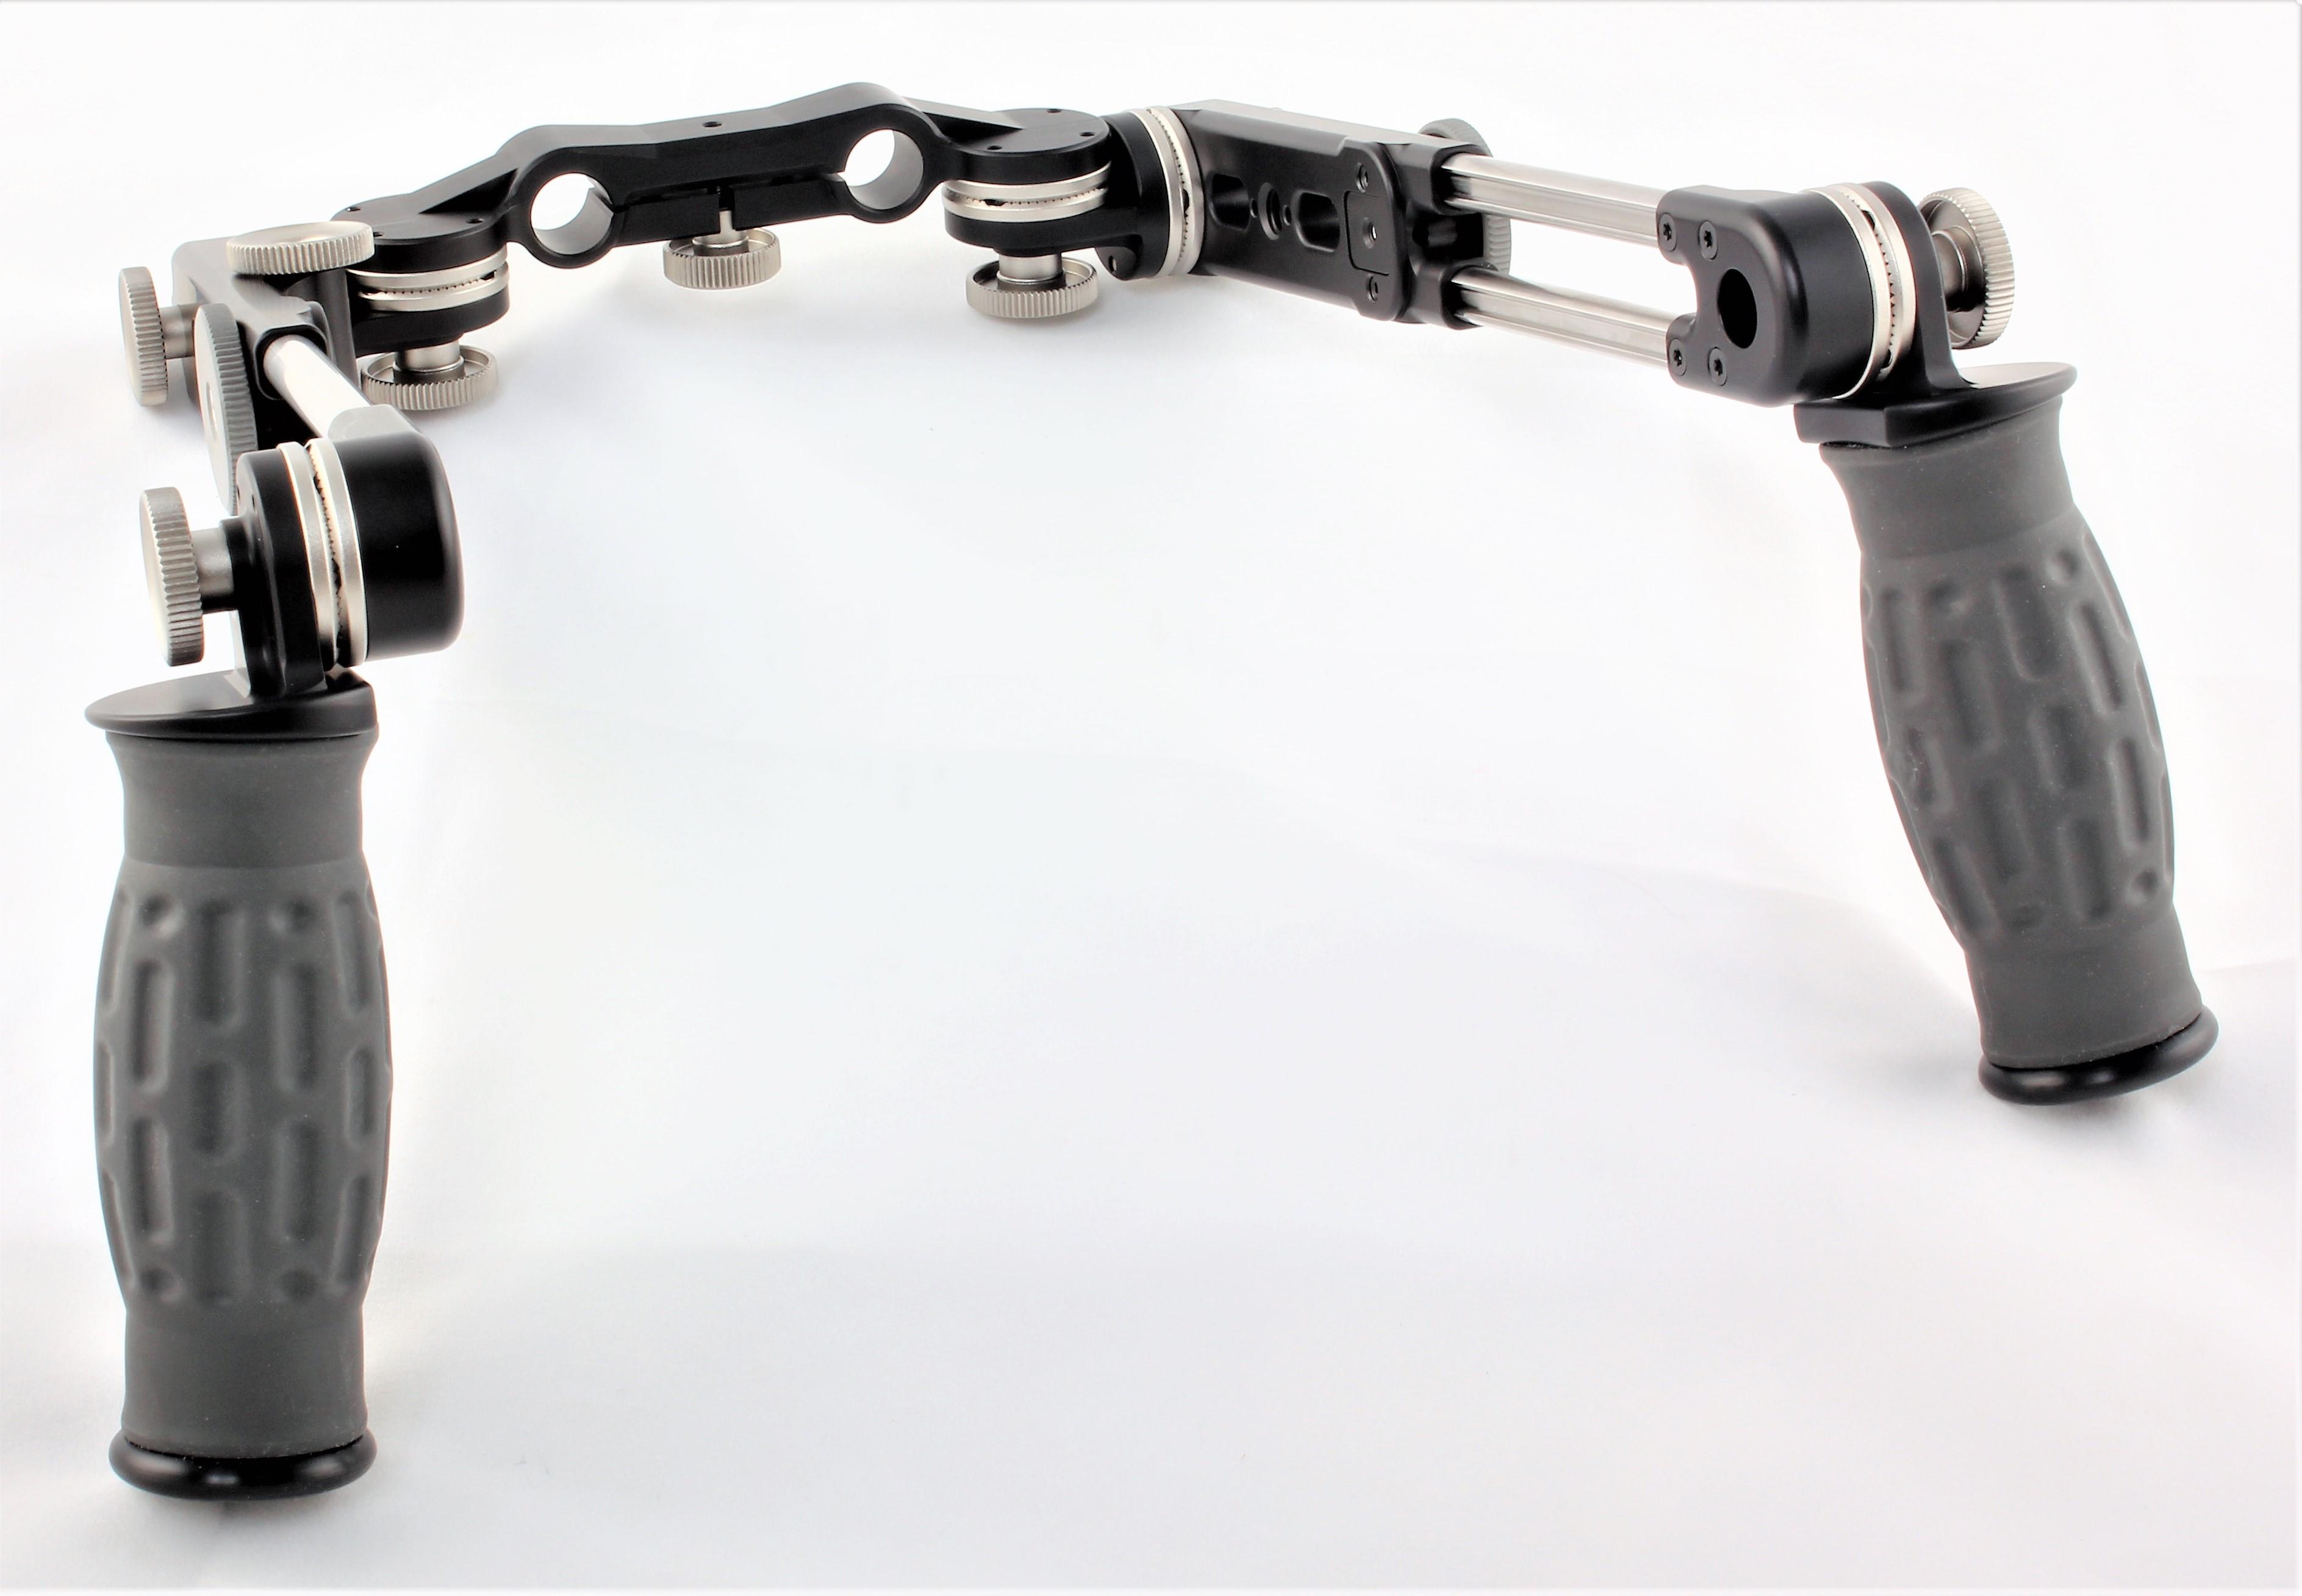 SP2-AX-M60 Image